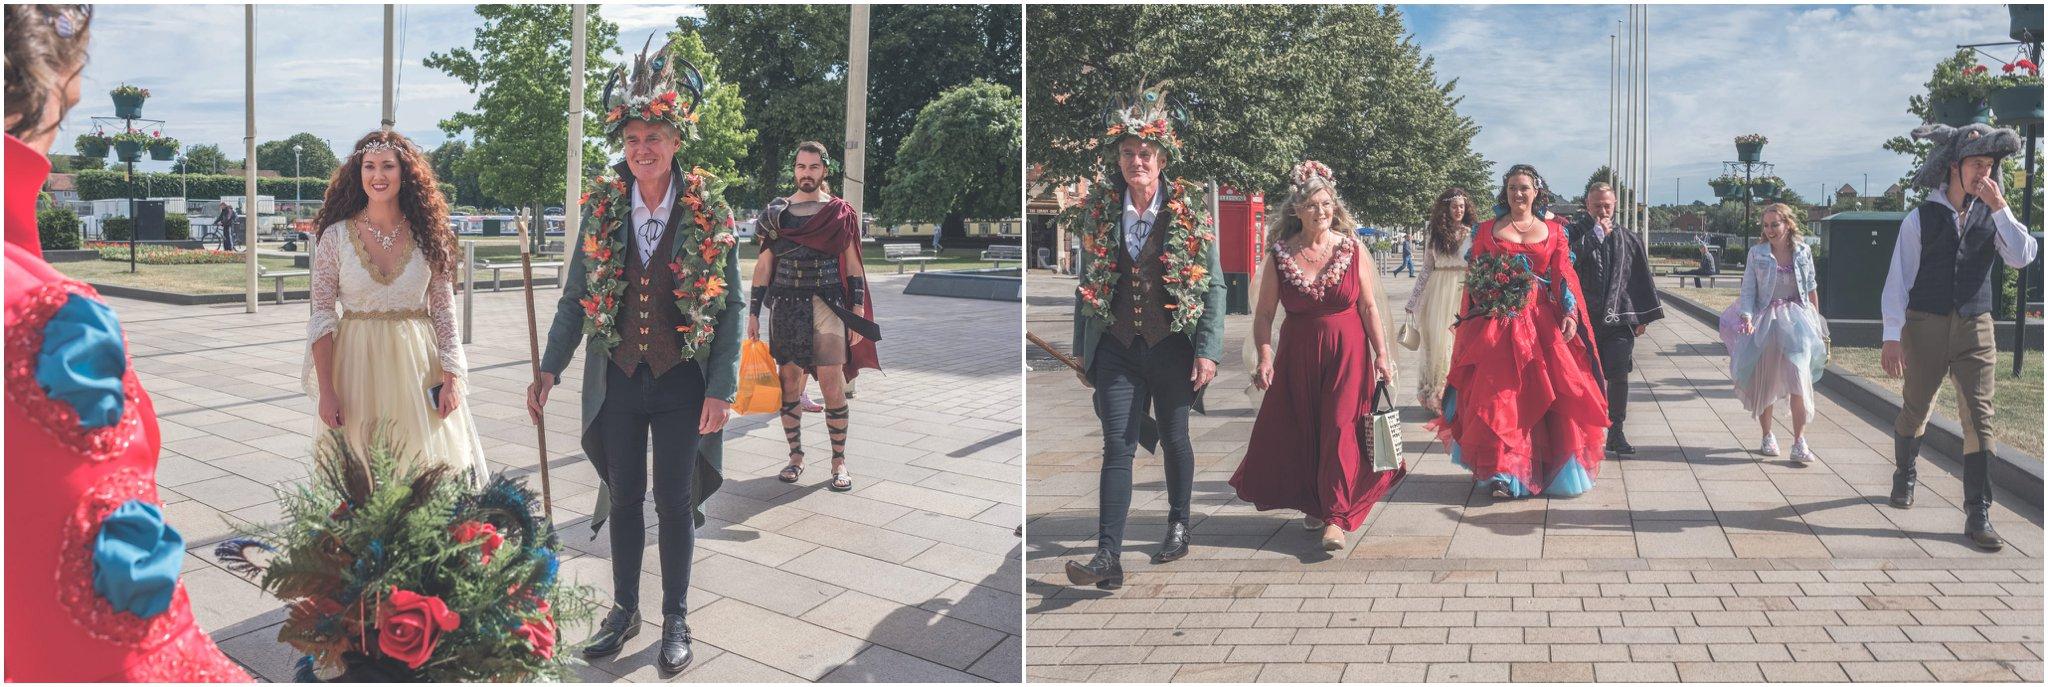 Stratford-Upon-Avon-Wedding - Robin Ball Photography-12.jpg